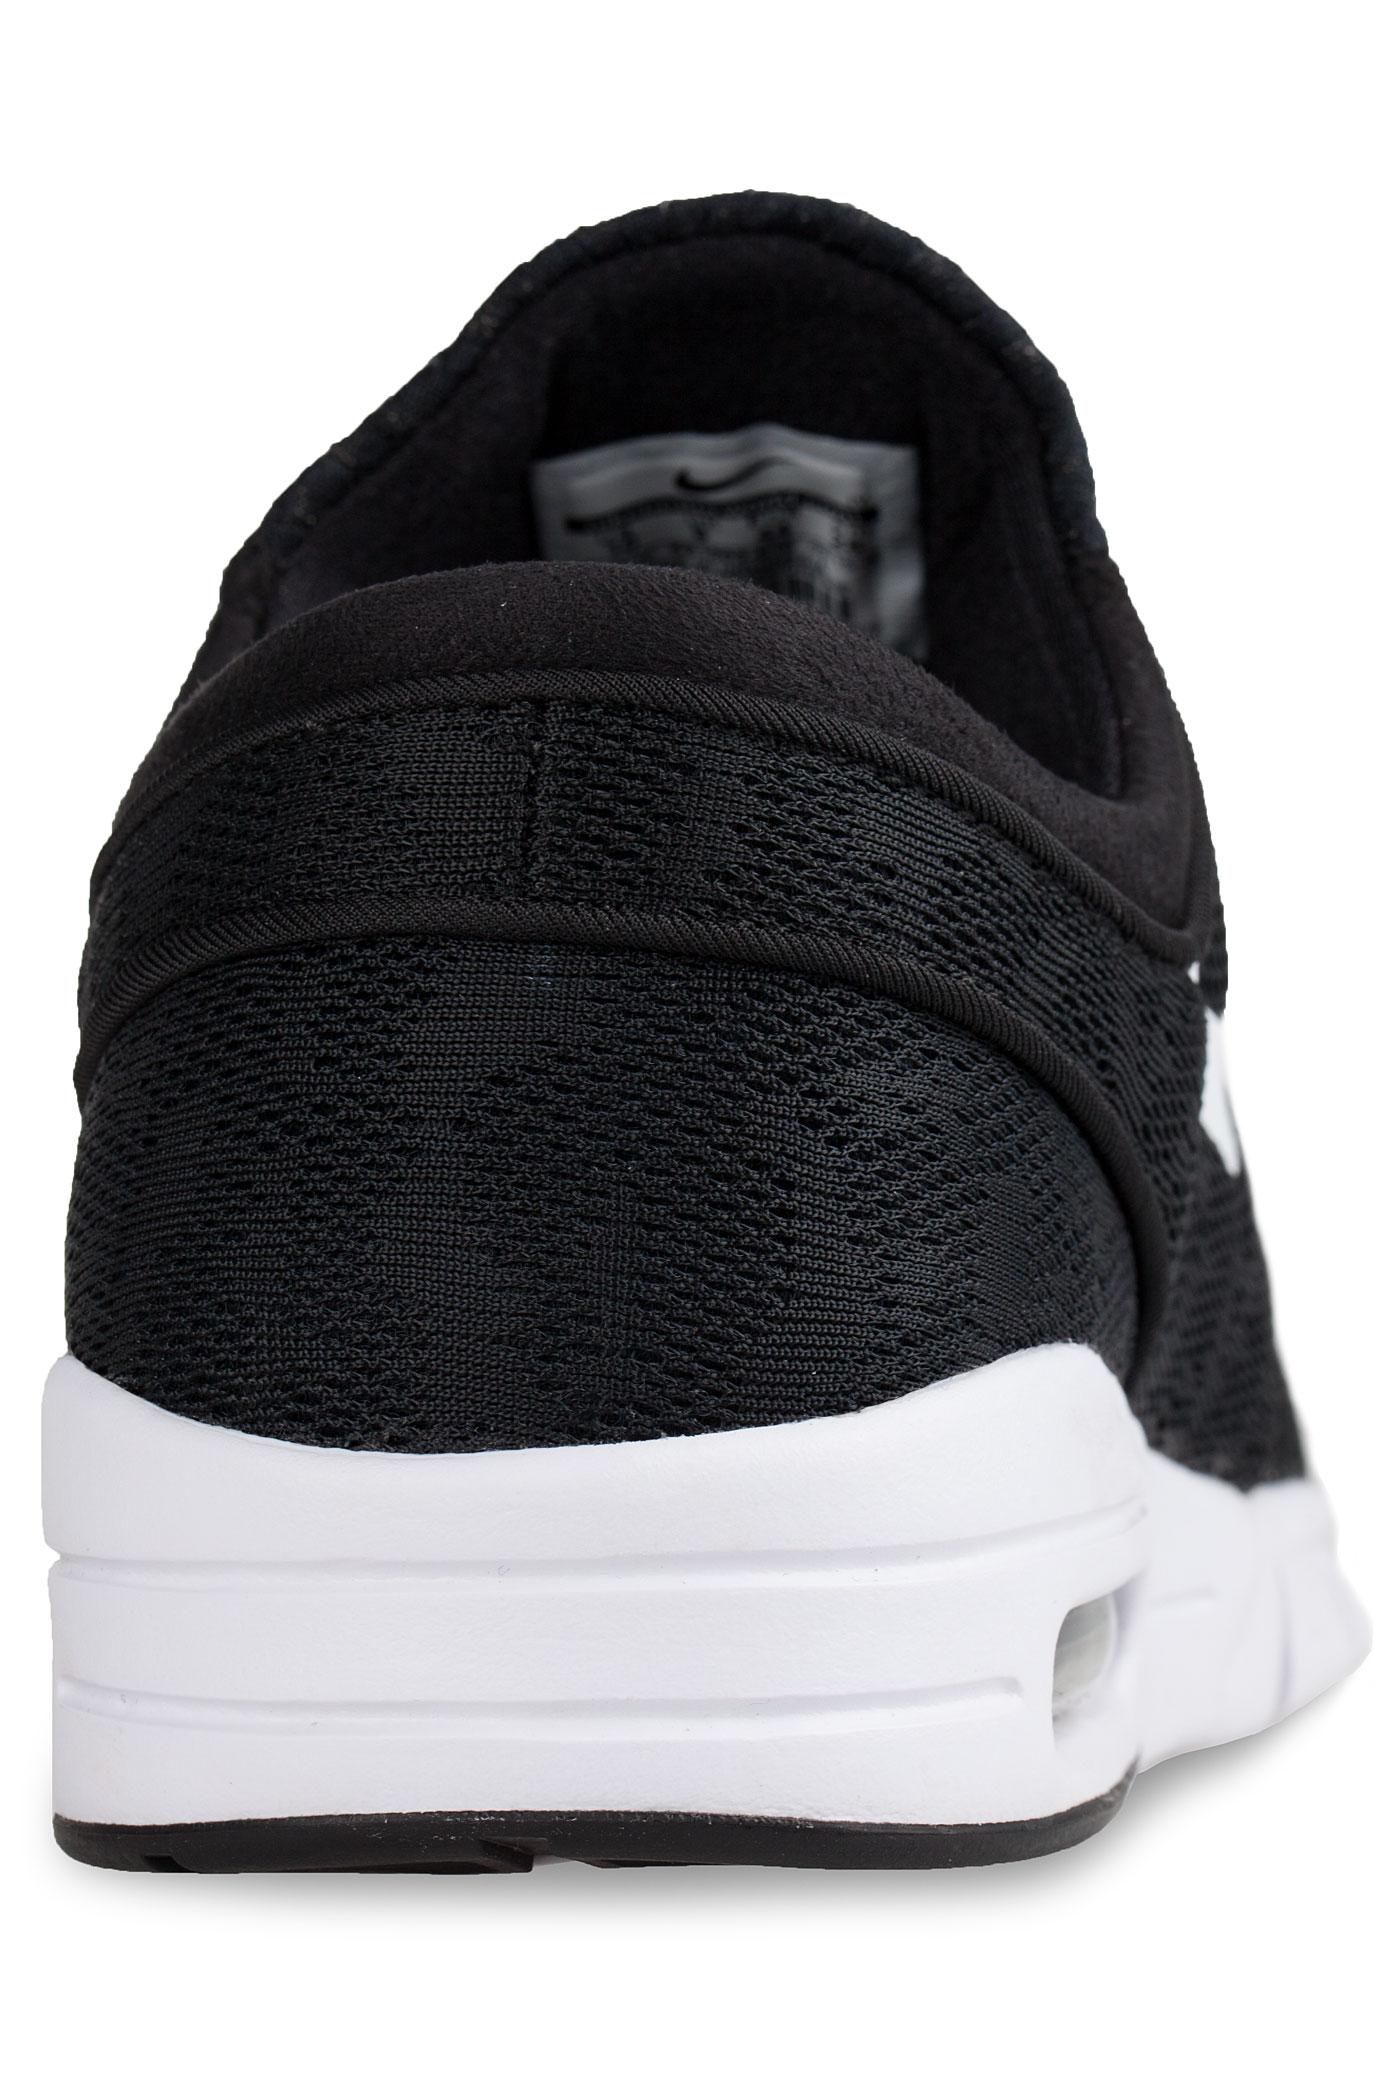 Nike Janoski Kaufen